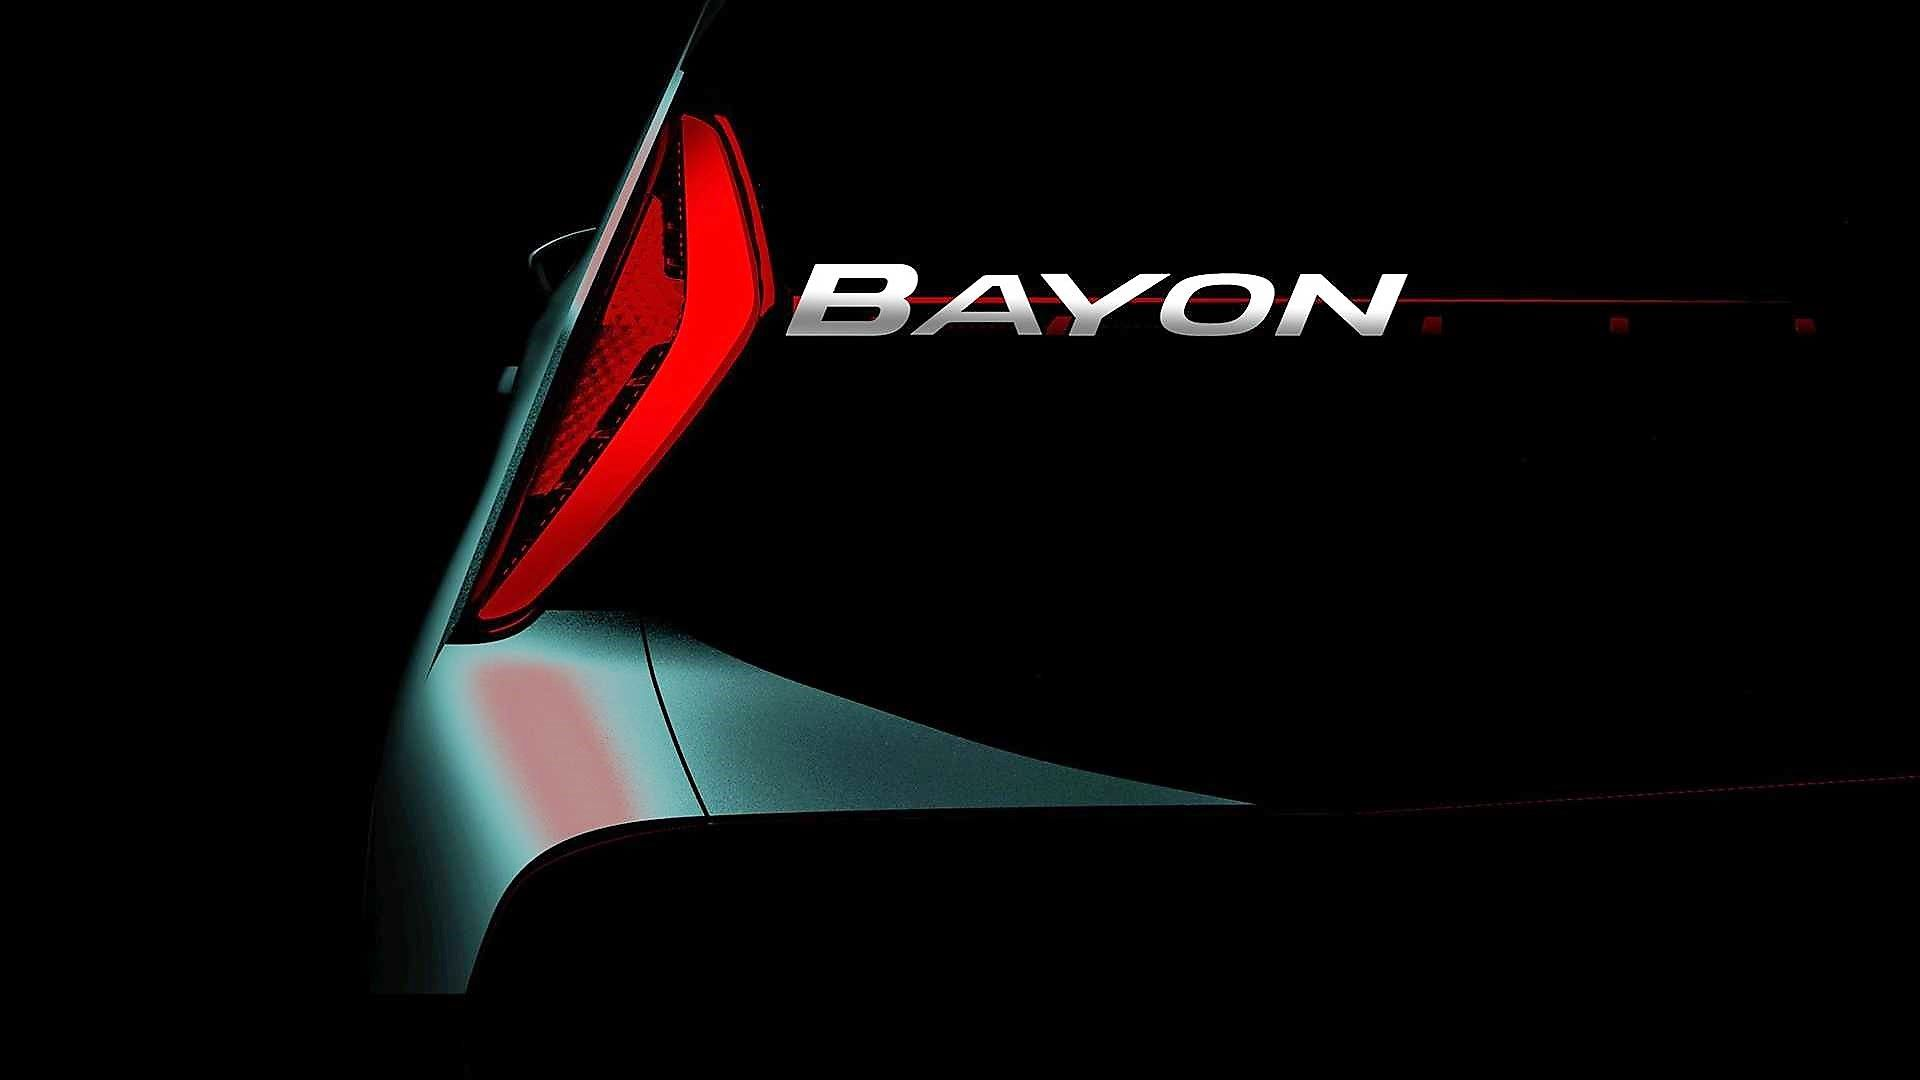 Hyundai-Bayon-teasers-4